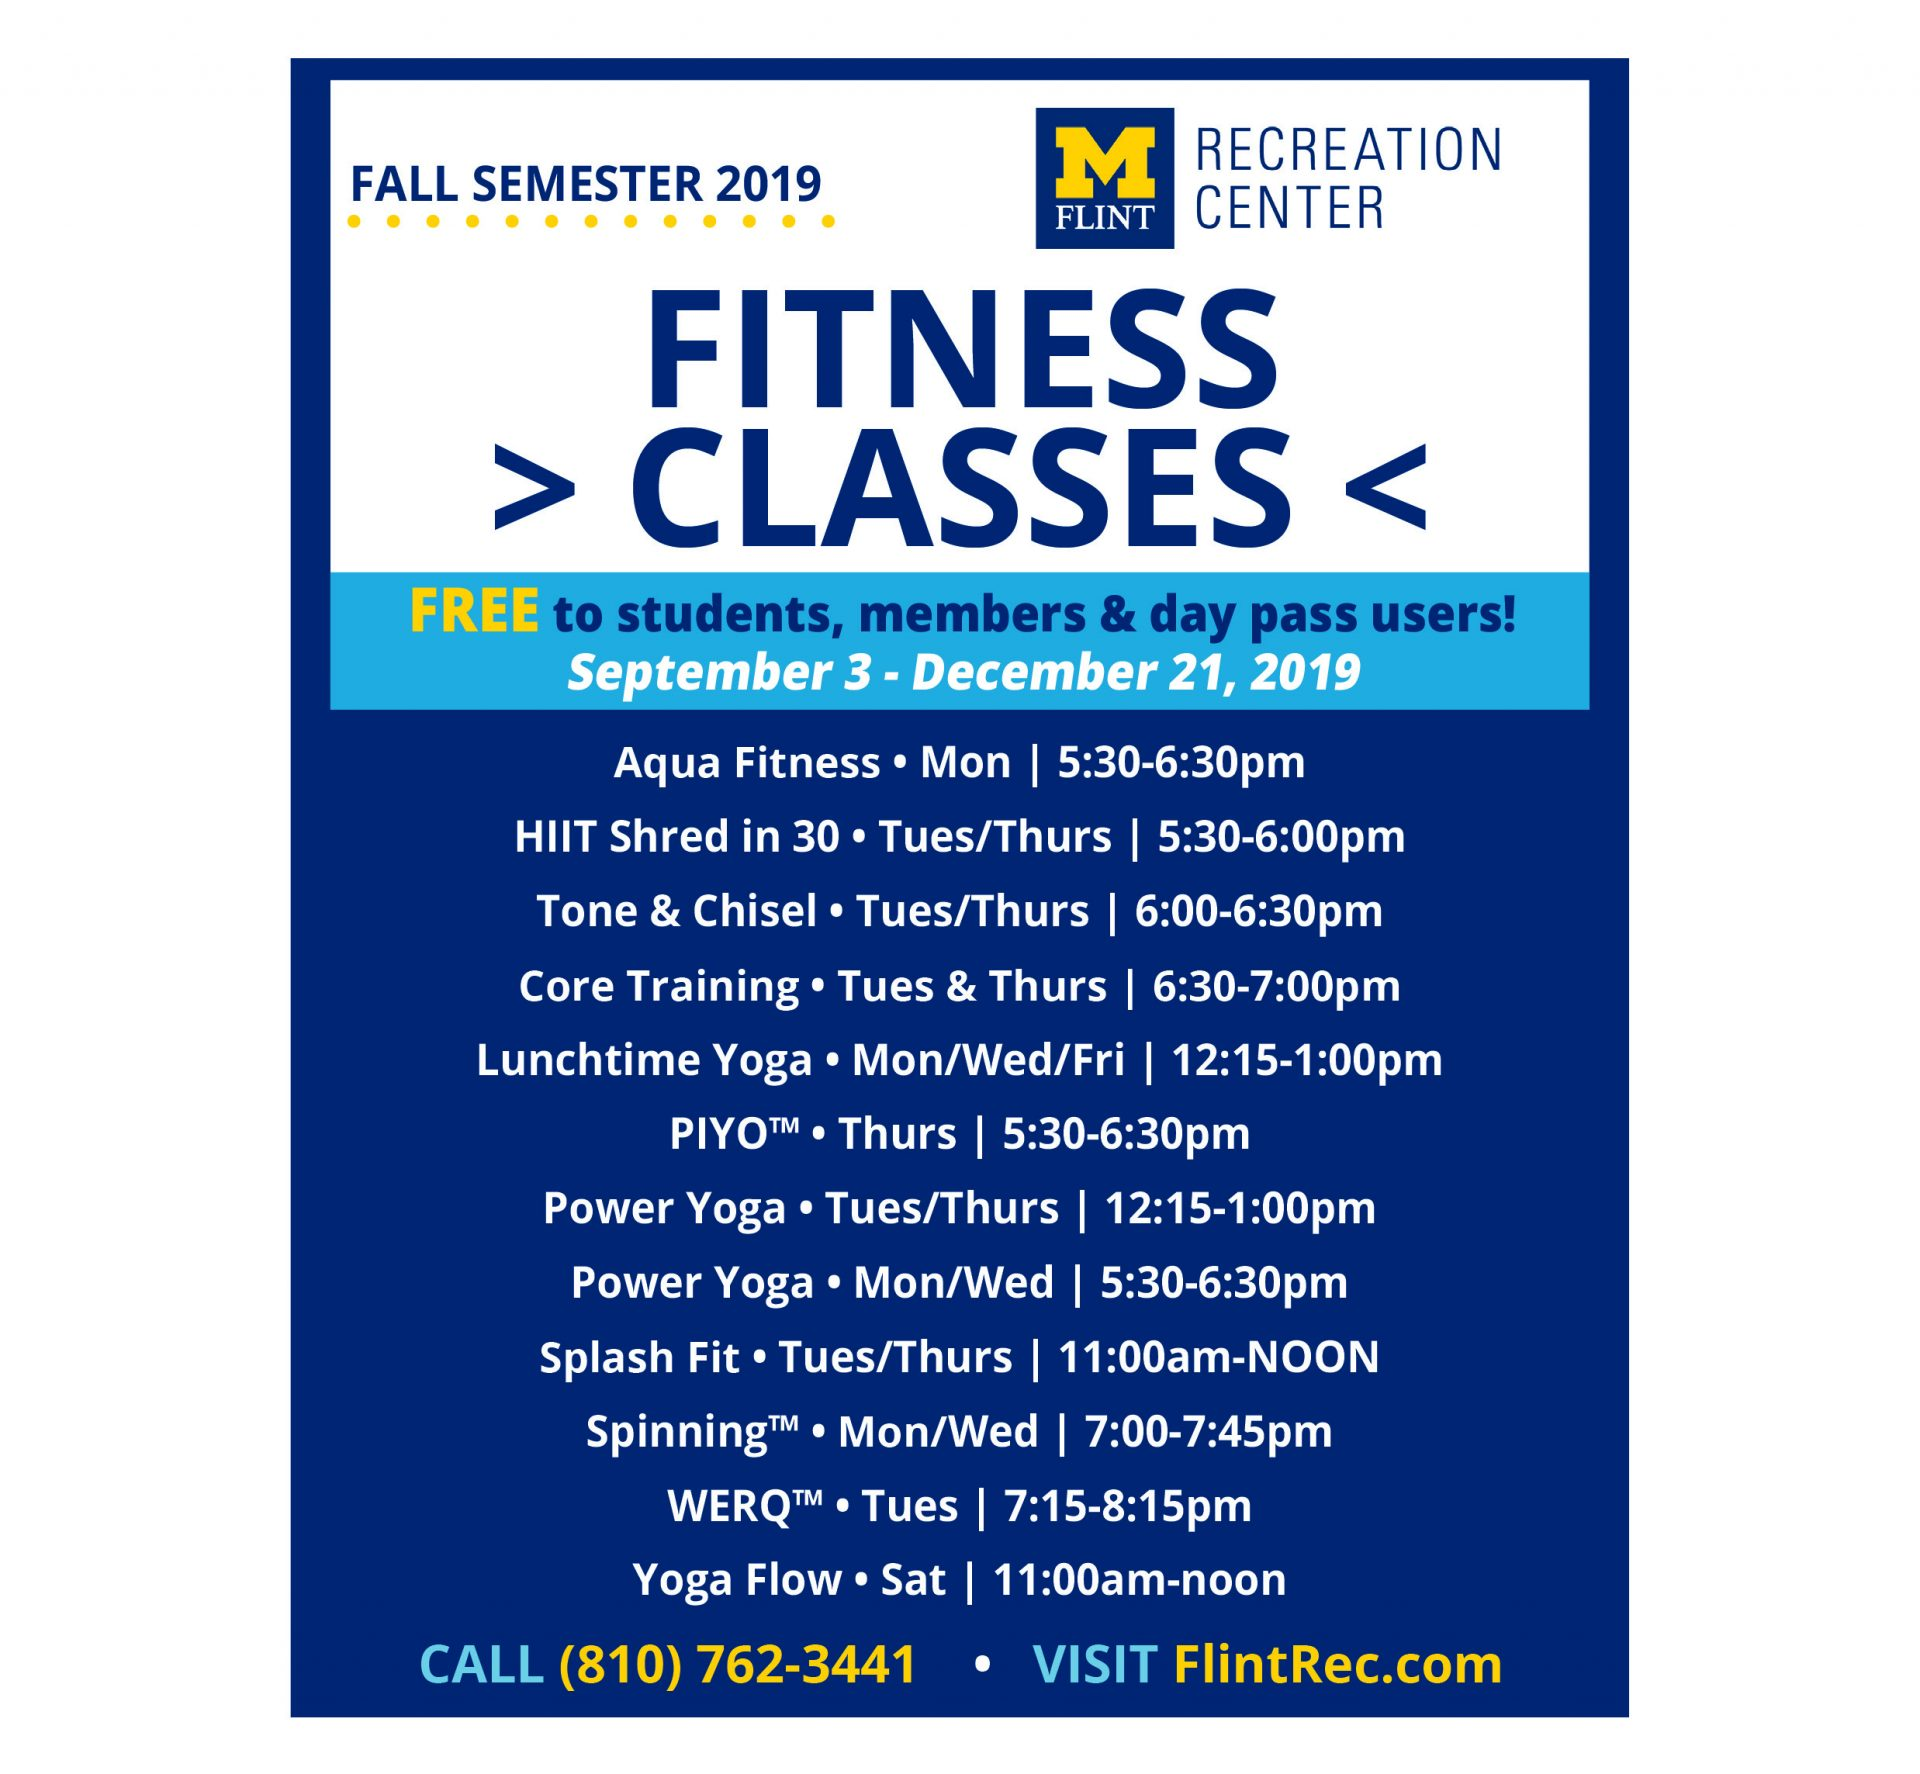 Fall 2019 Fitness Class Schedule